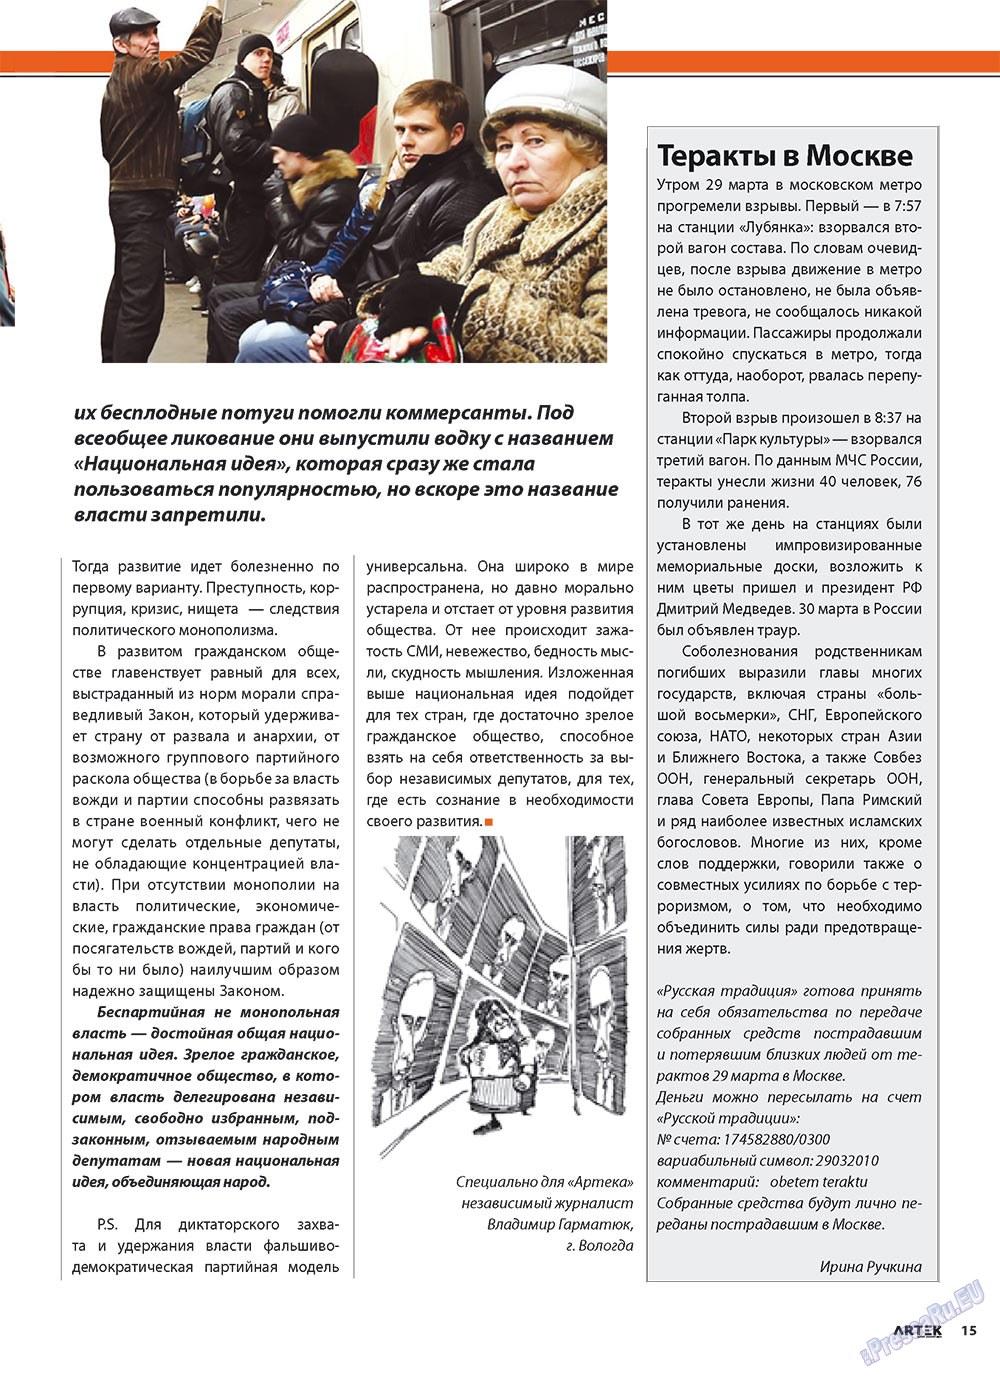 Артек (журнал). 2010 год, номер 2, стр. 17